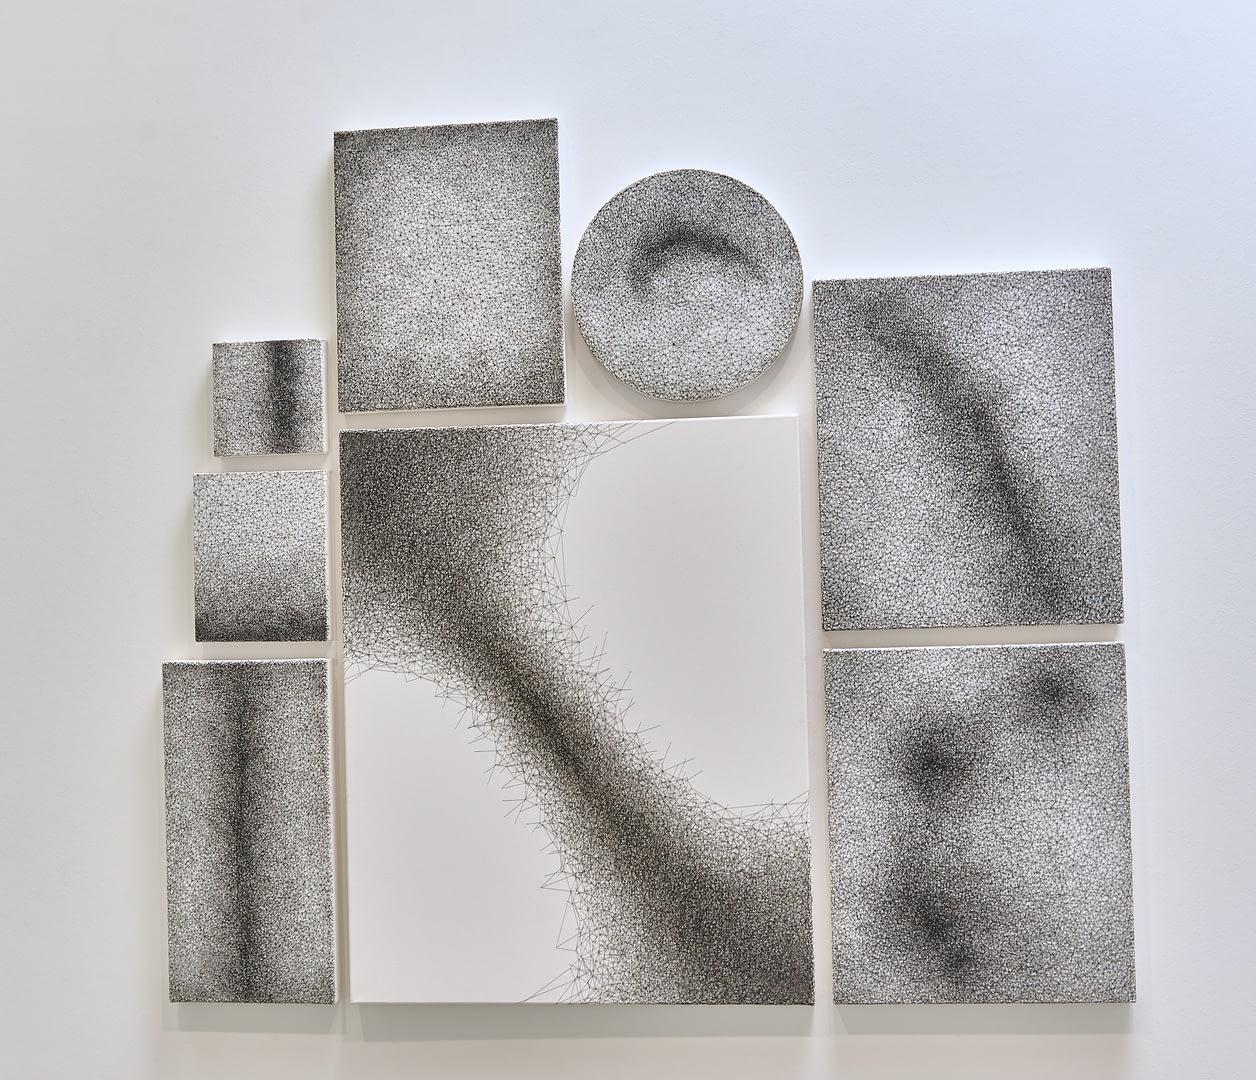 Chiharu Shiota at BlainSouthern für ArtBerlin 0088